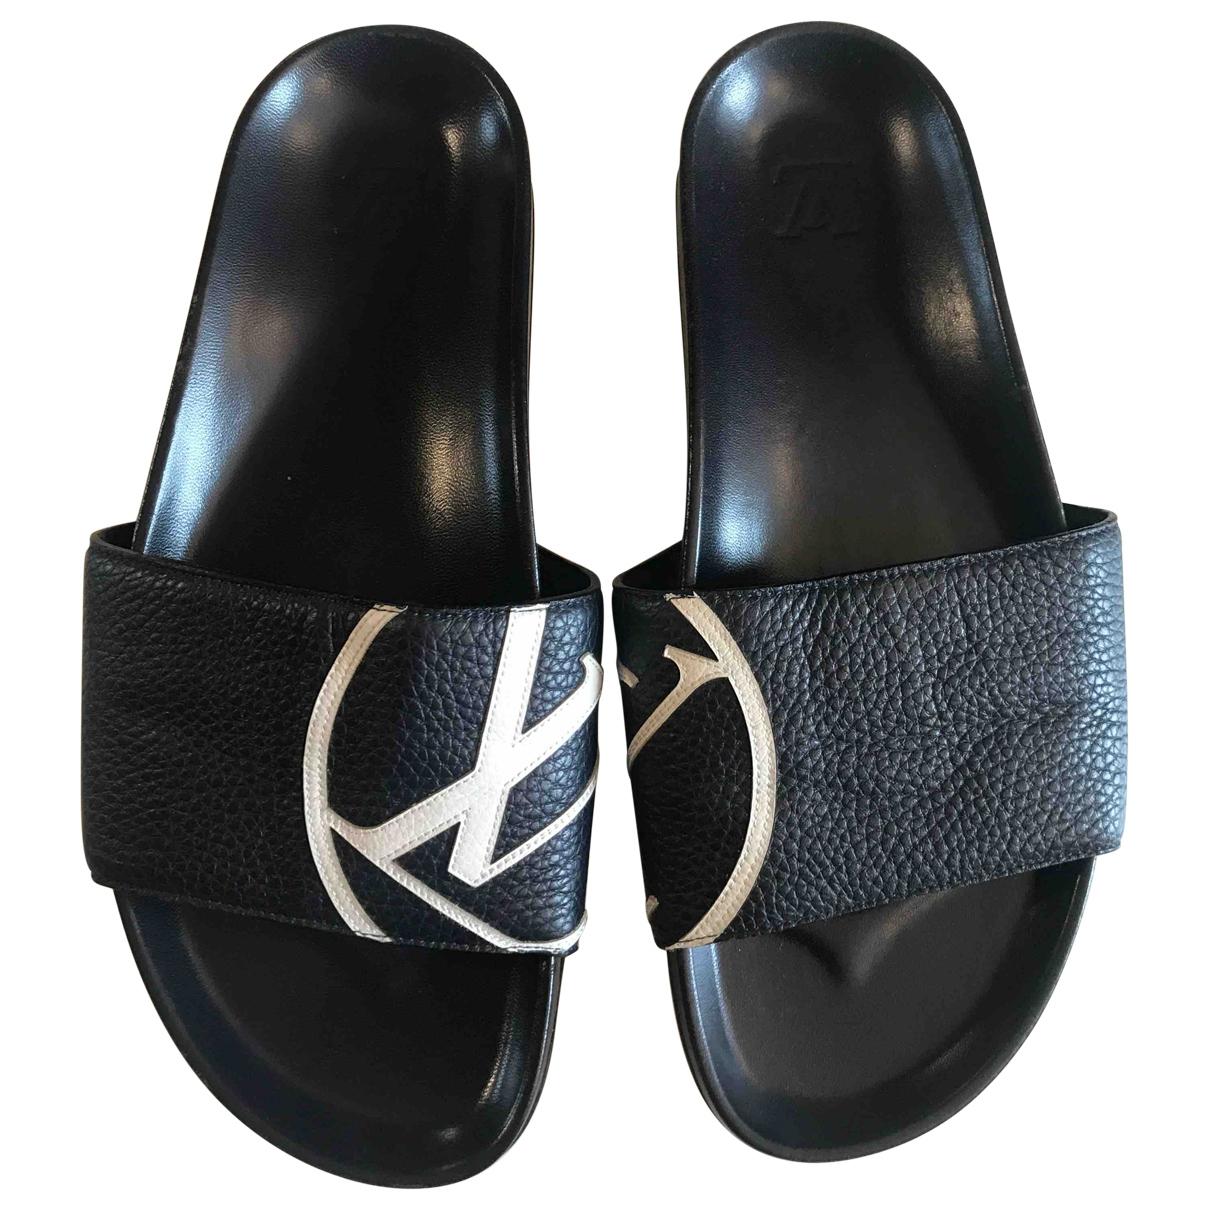 Louis Vuitton Waterfront Navy Leather Sandals for Men 43 EU